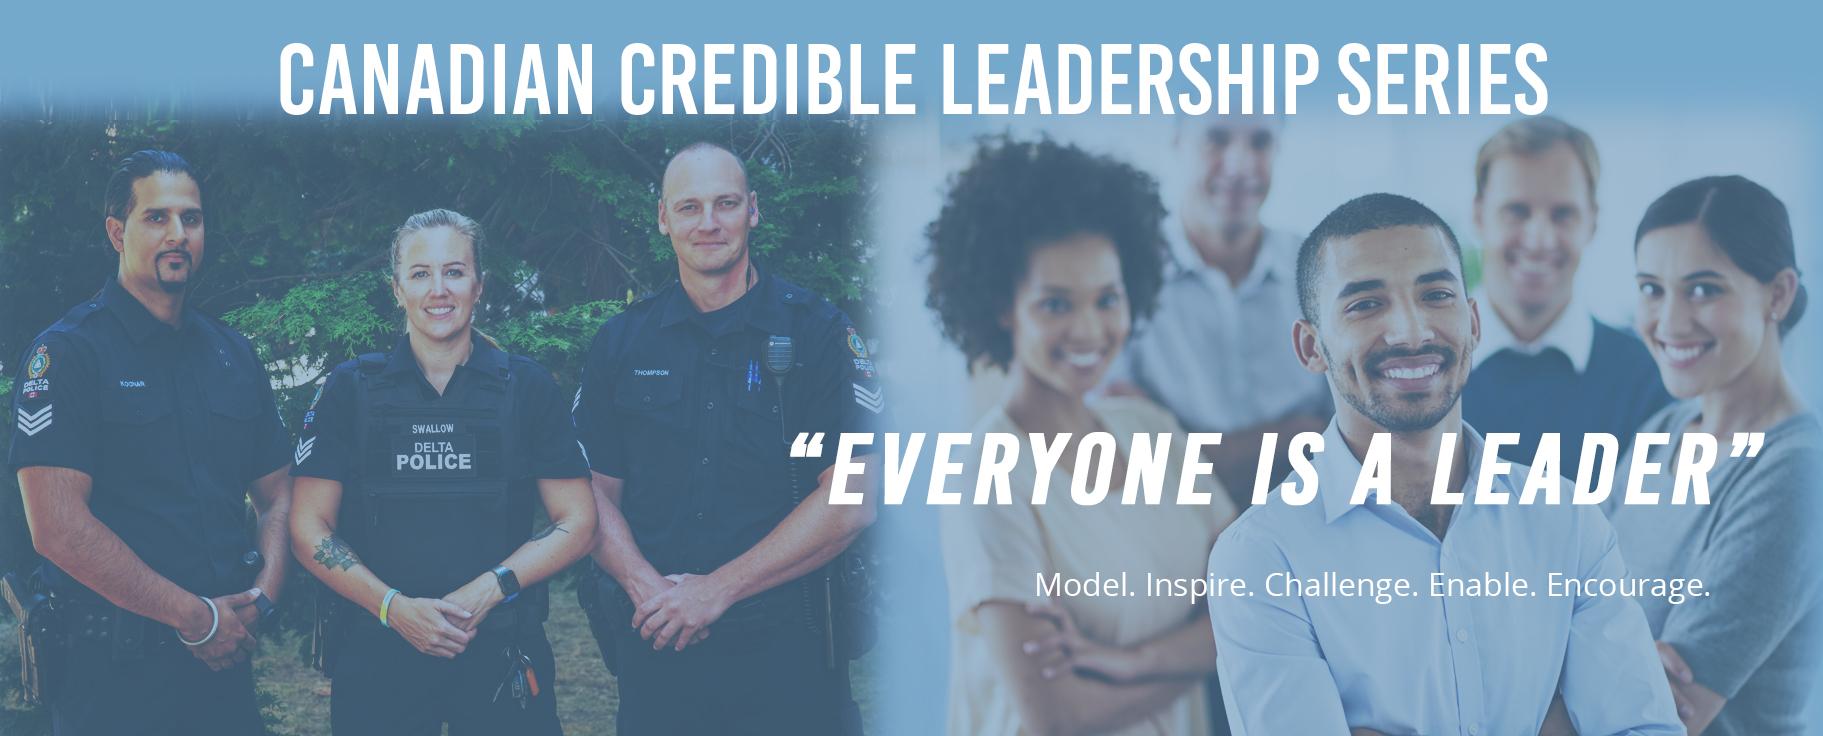 CPKN leadership pic (003)